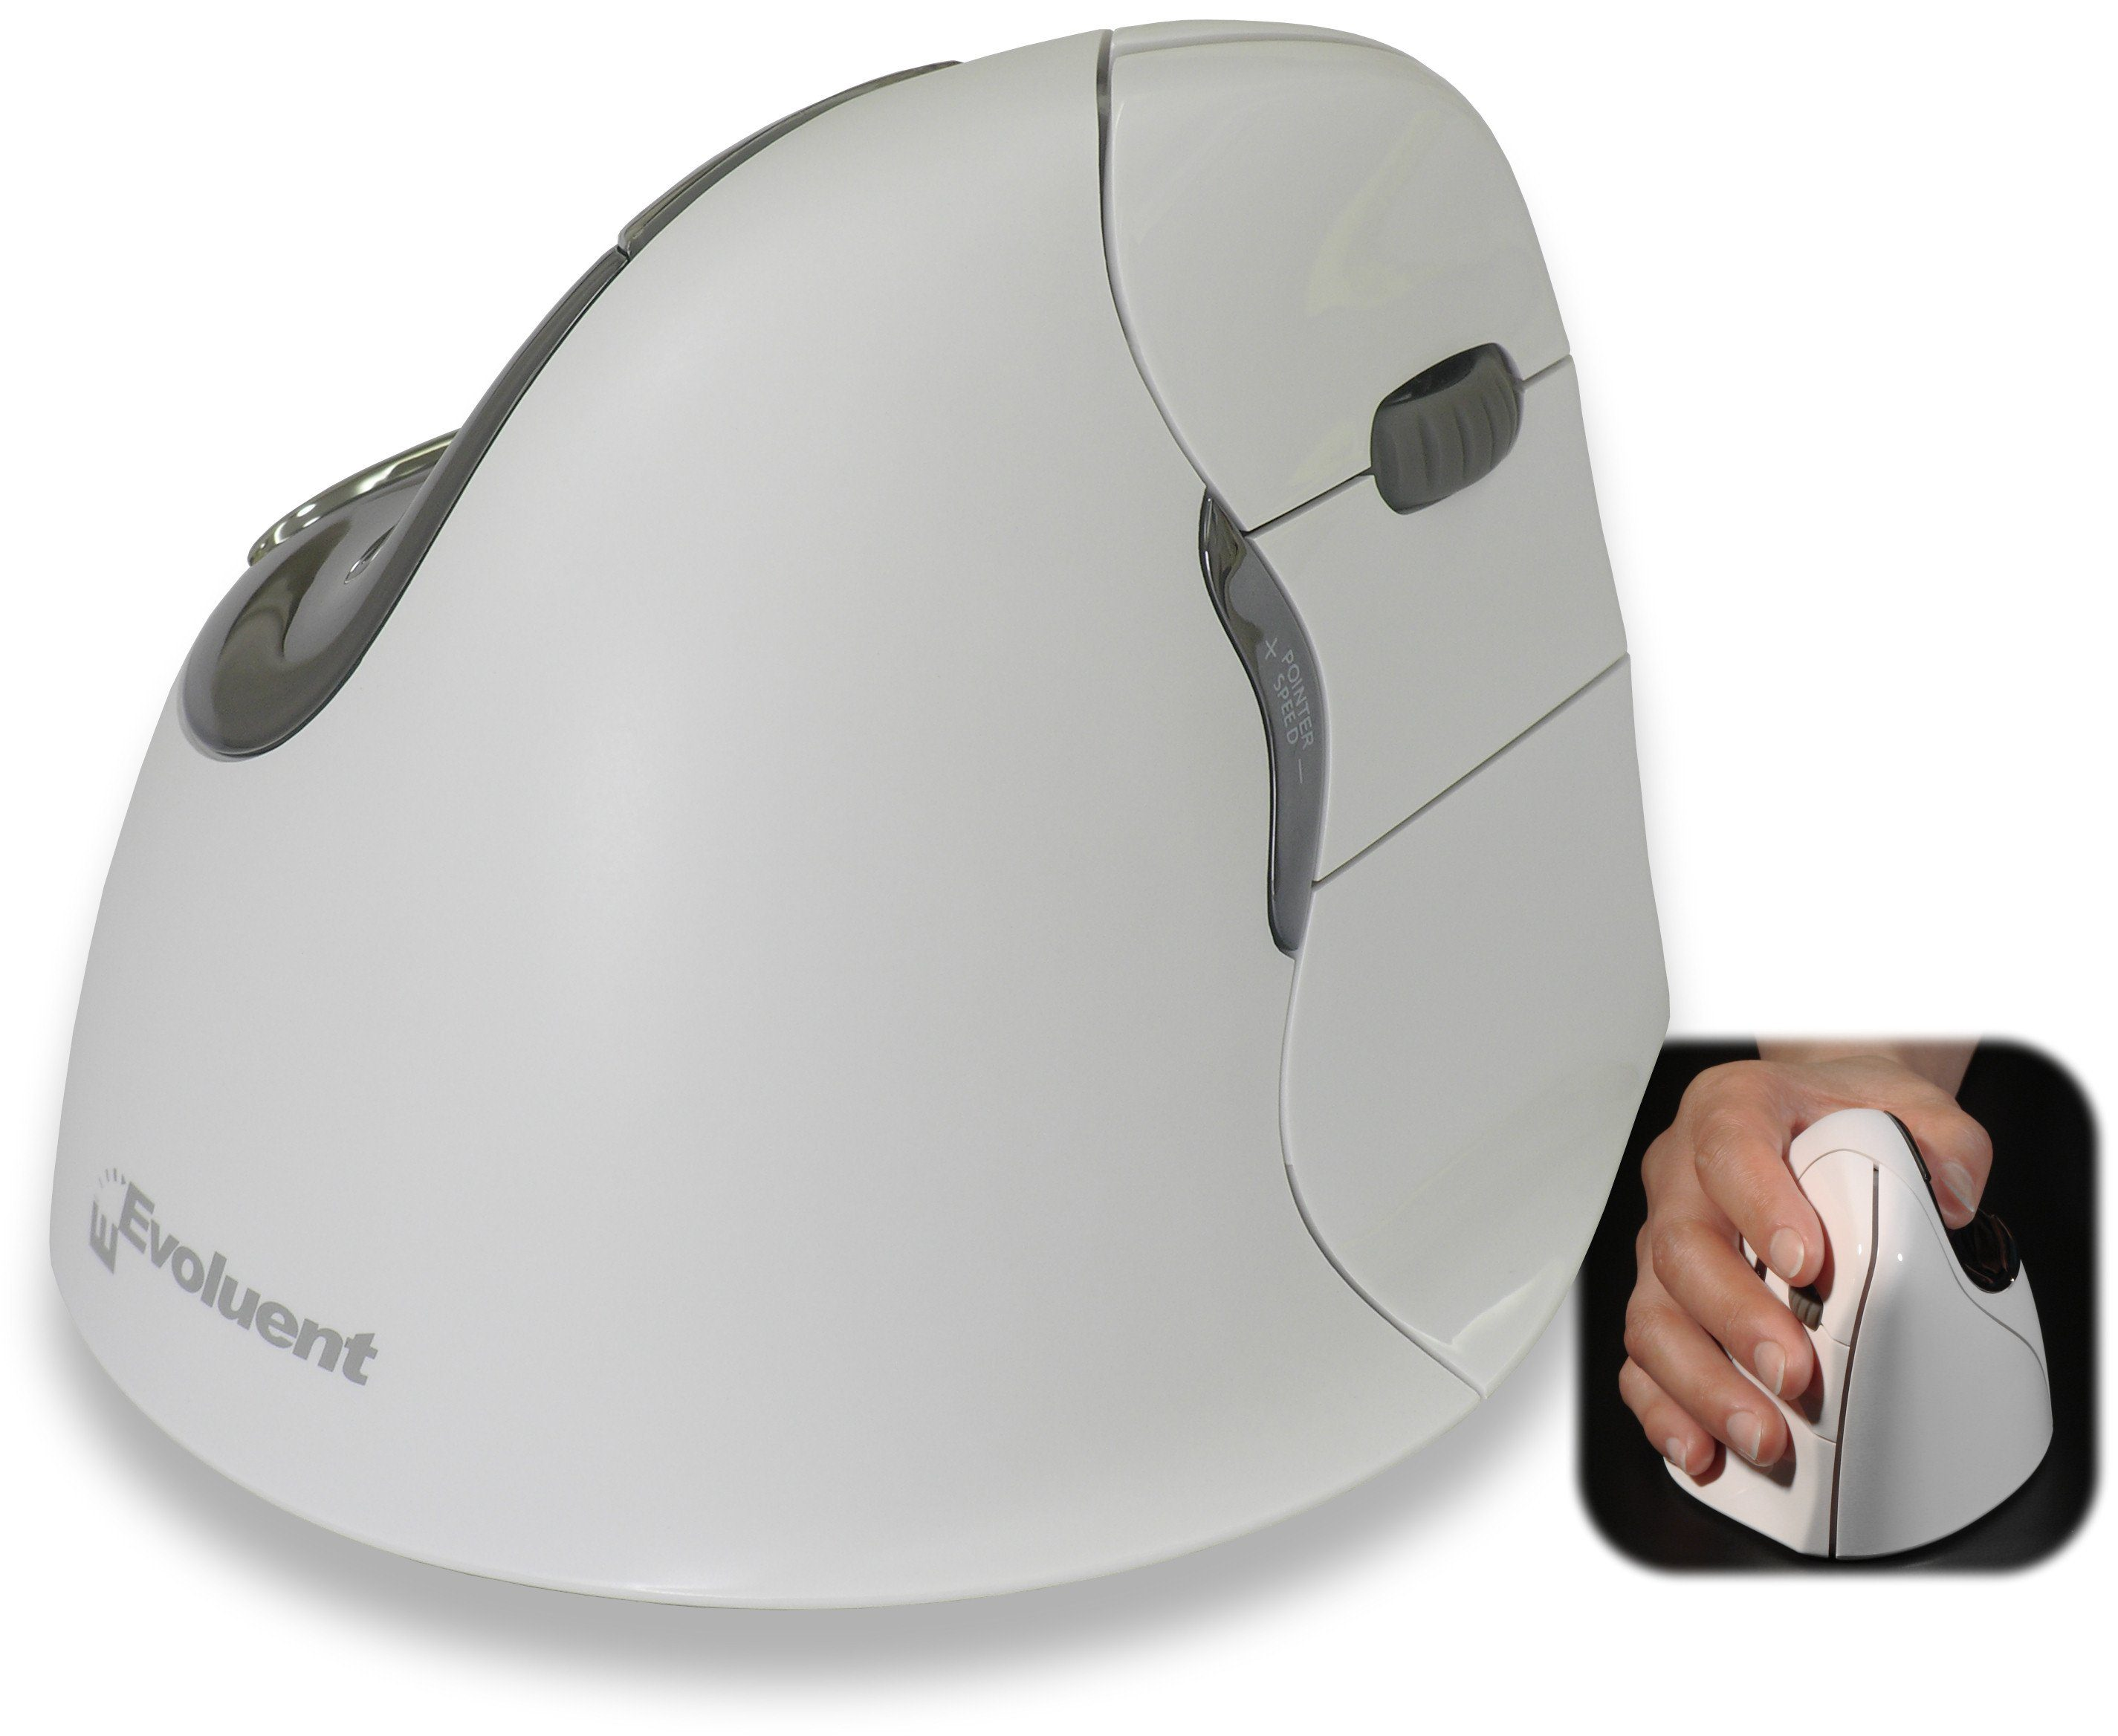 EVOLUENT Peripherie-Gerät »Vertical Mouse 4 Bluetooth Rechte Hand«